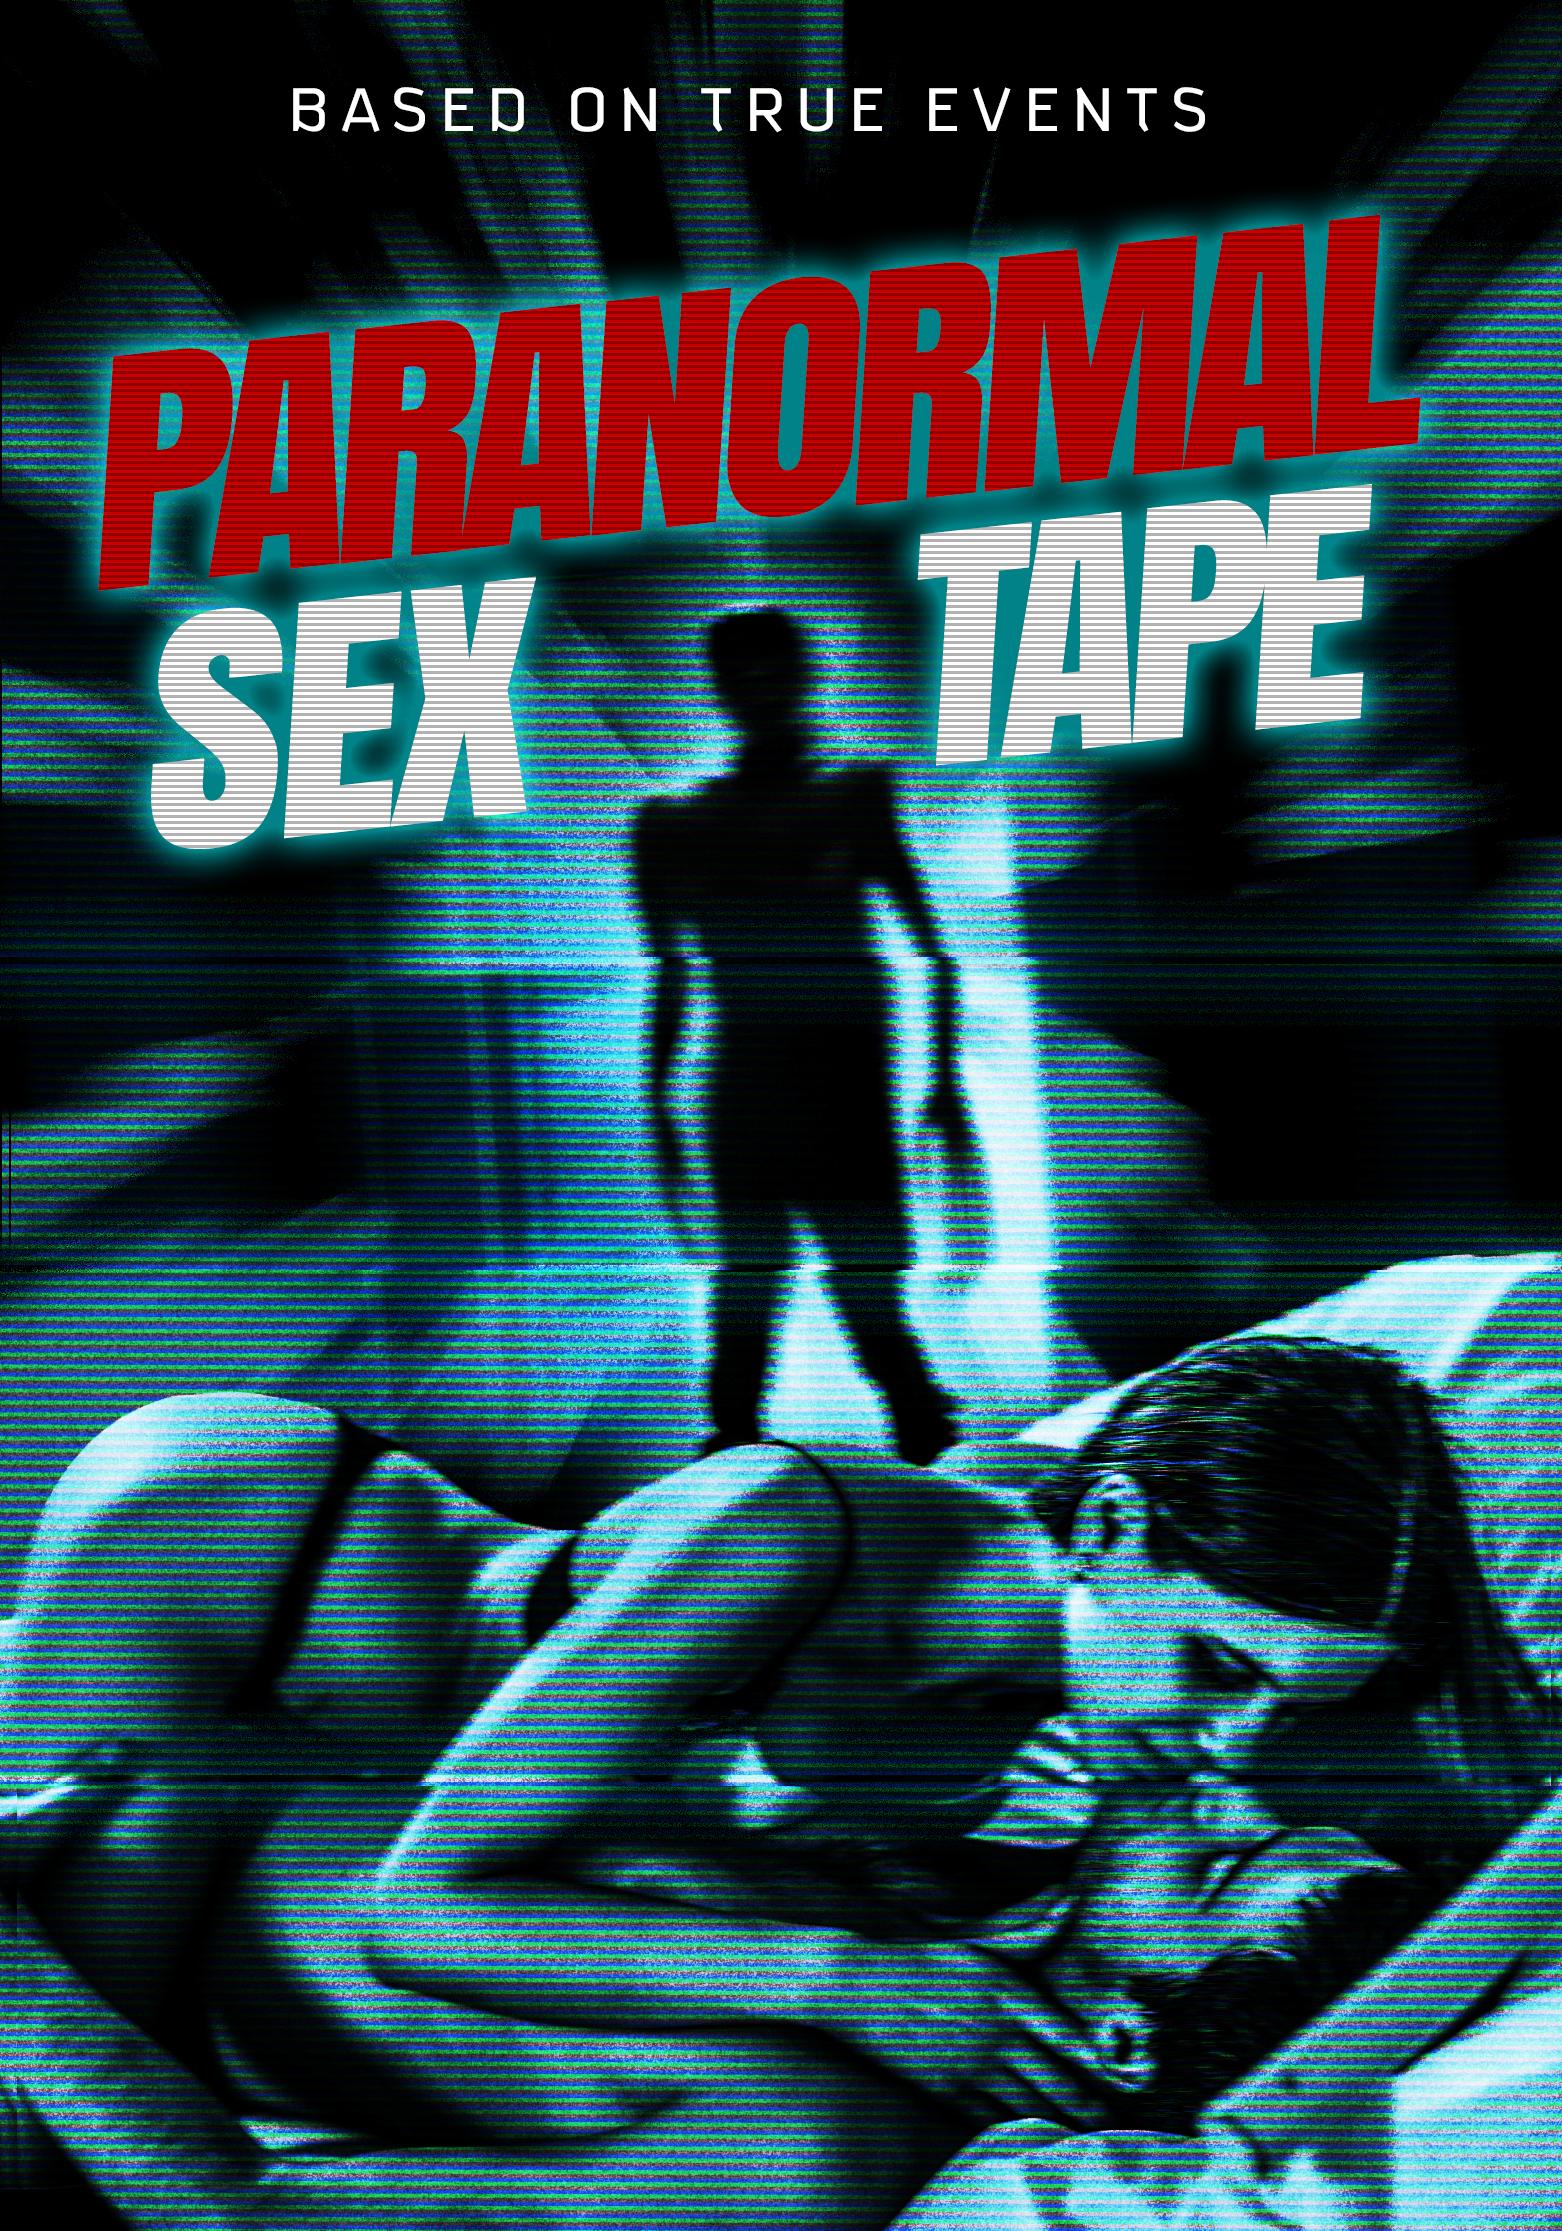 Angela sex davies movie stars tapes